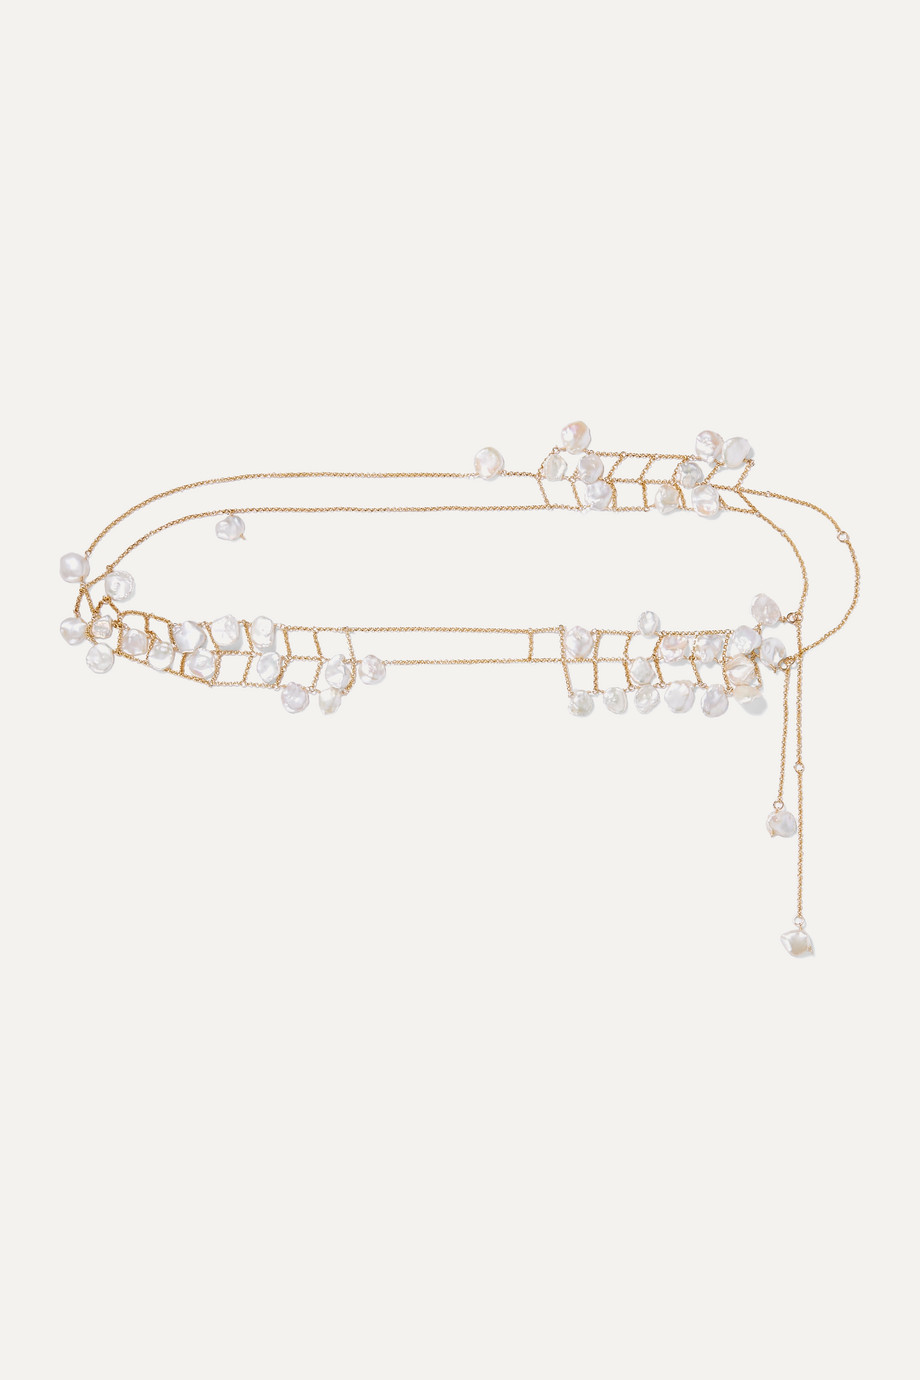 Alighieri Castaway gold-plated pearl belt